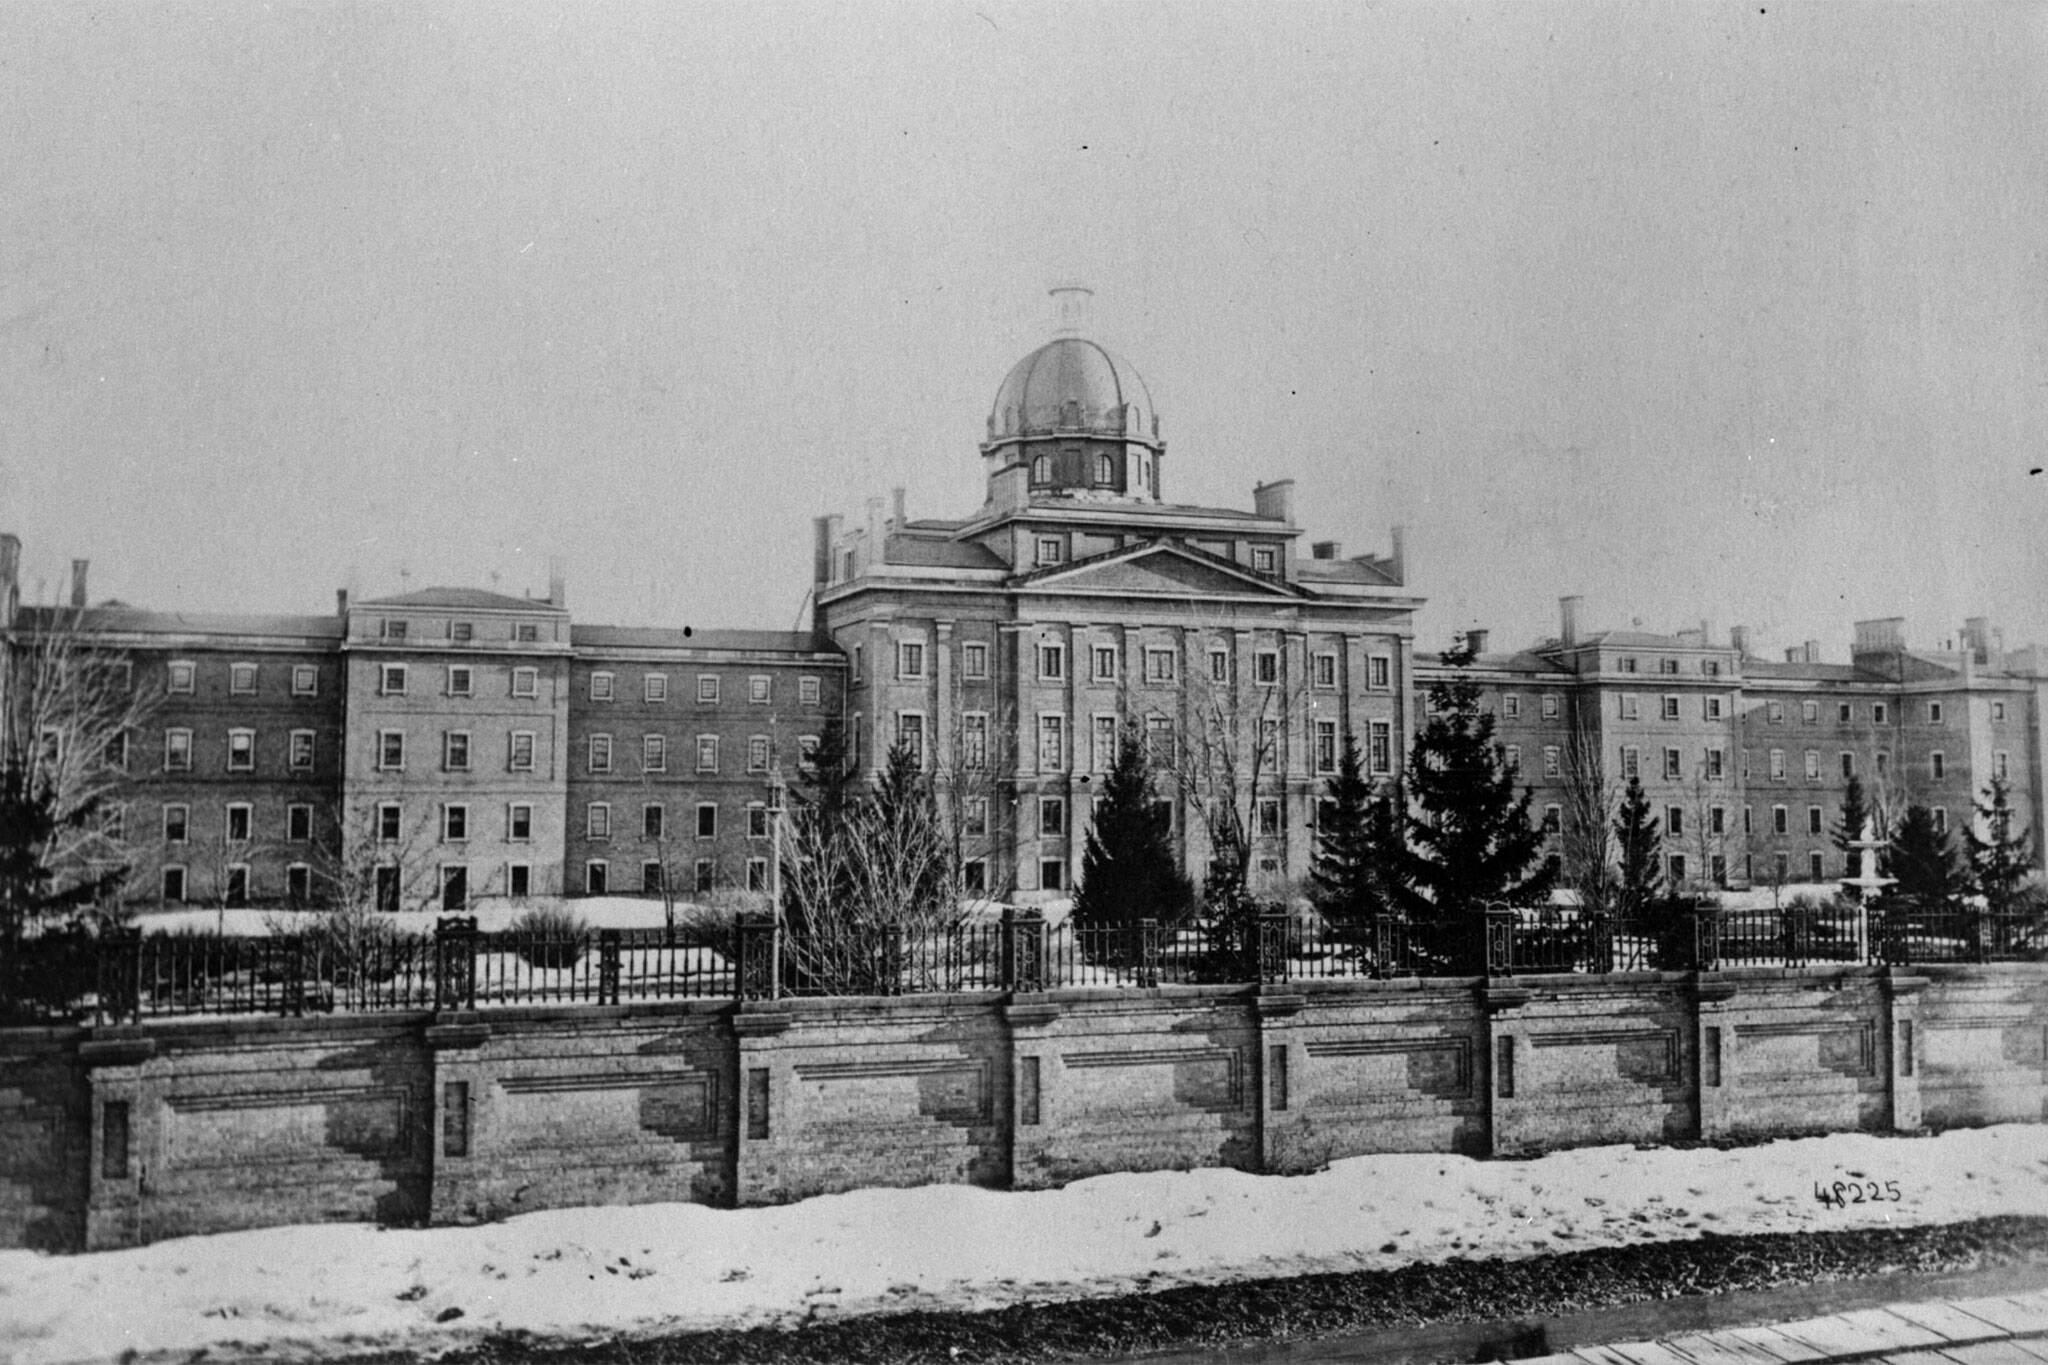 Toronto Lunatic Asylum